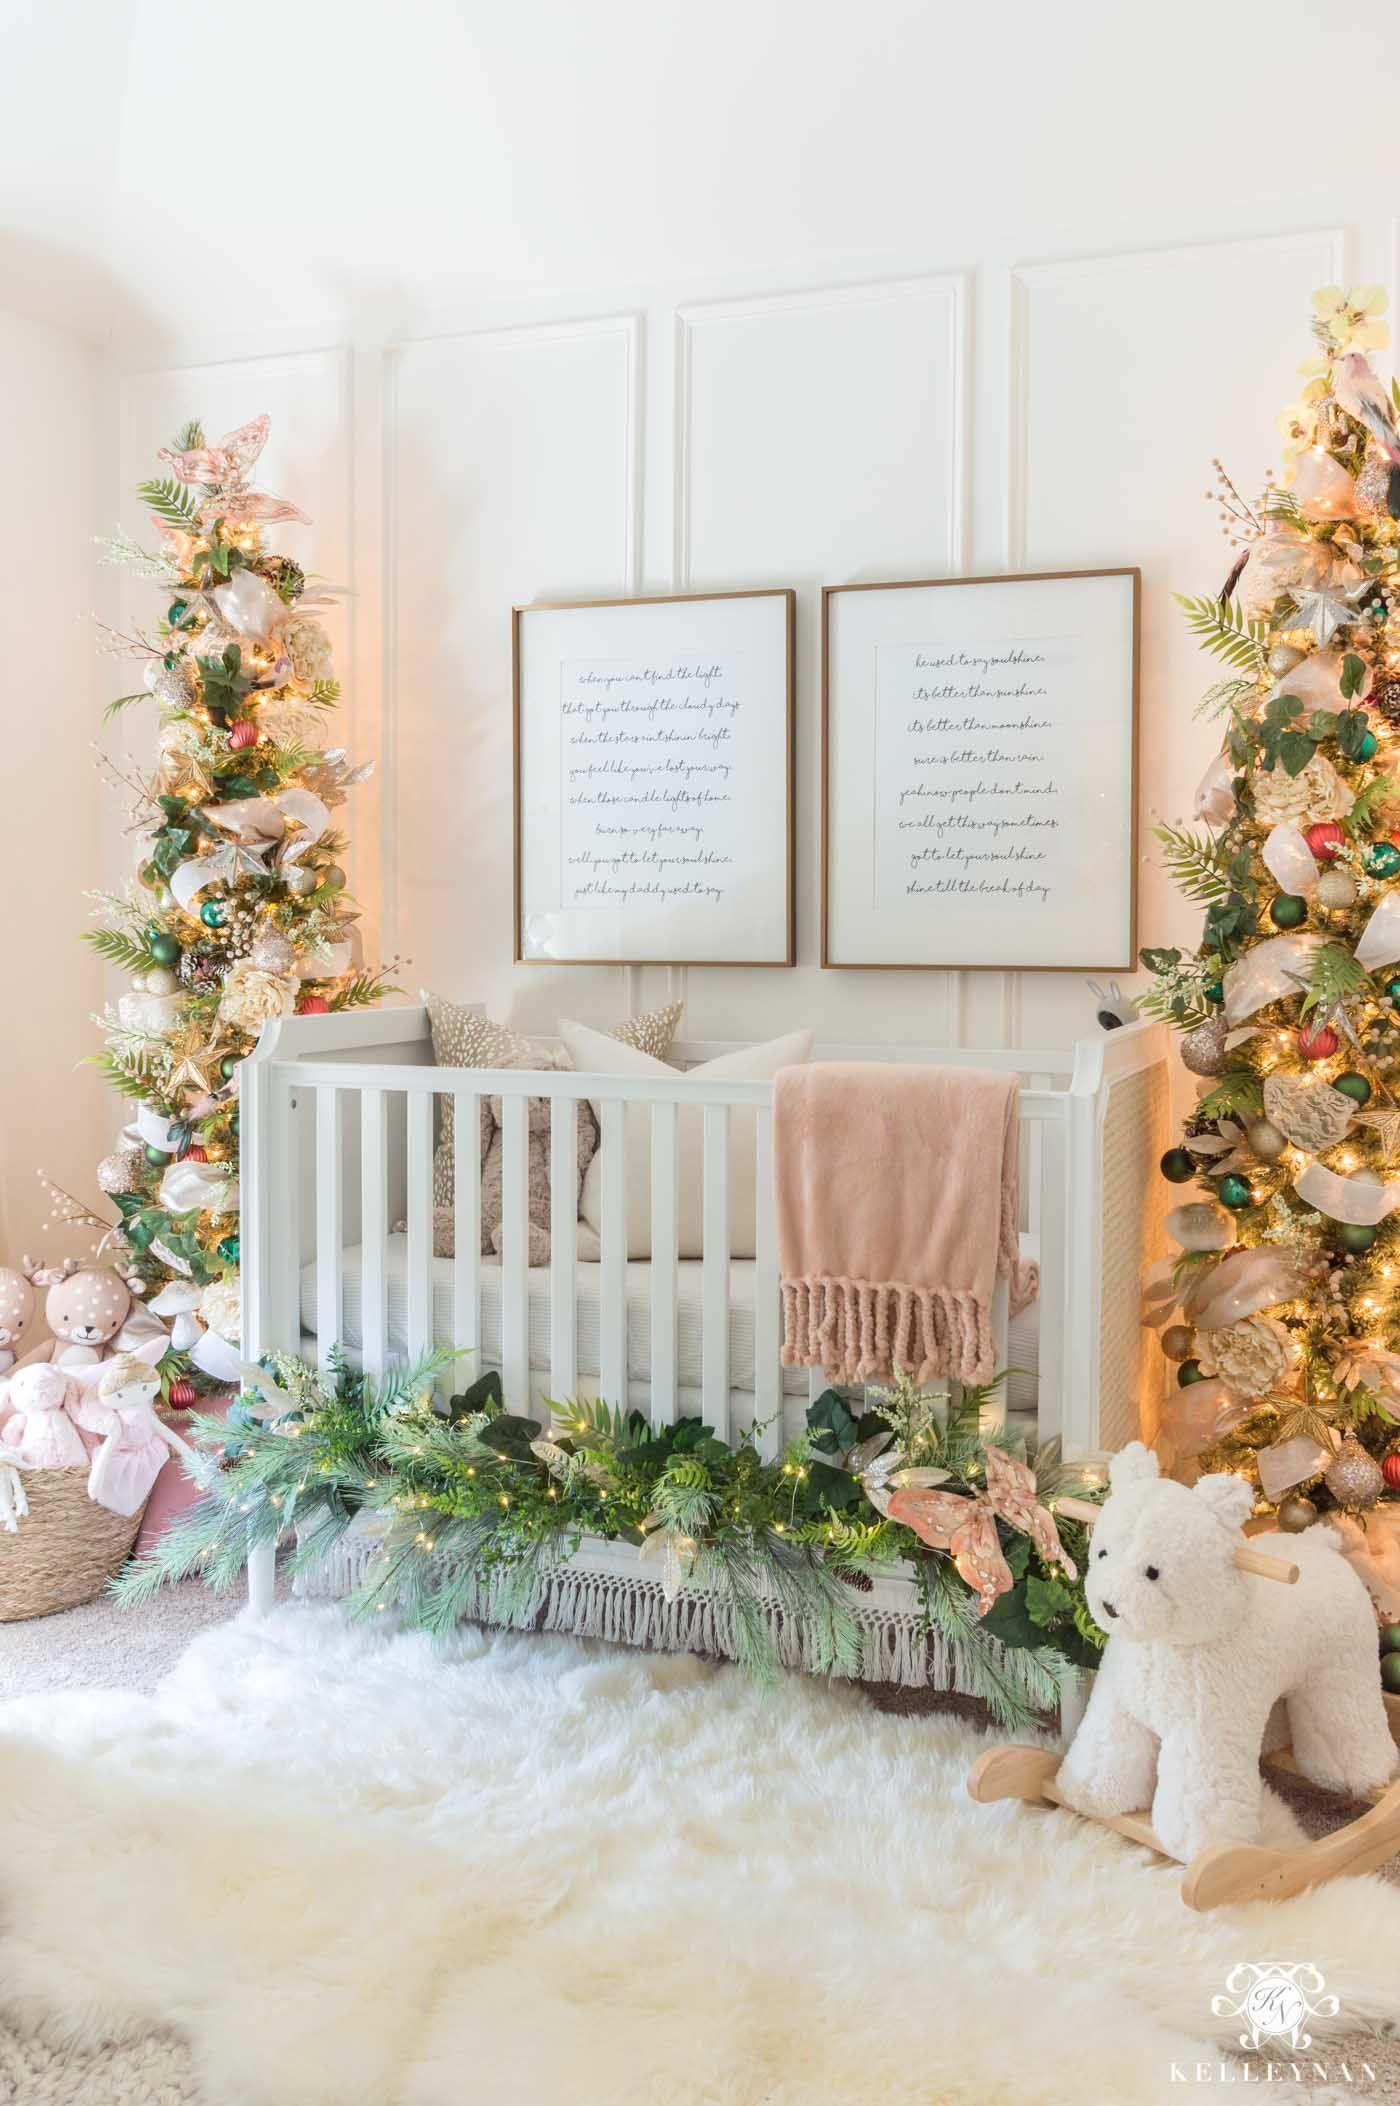 Nursery Christmas Decorations Whimsical Bedroom Ideas Kelley Nan Whimsical Bedroom Neutral Christmas Decor Christmas Decorations Bedroom